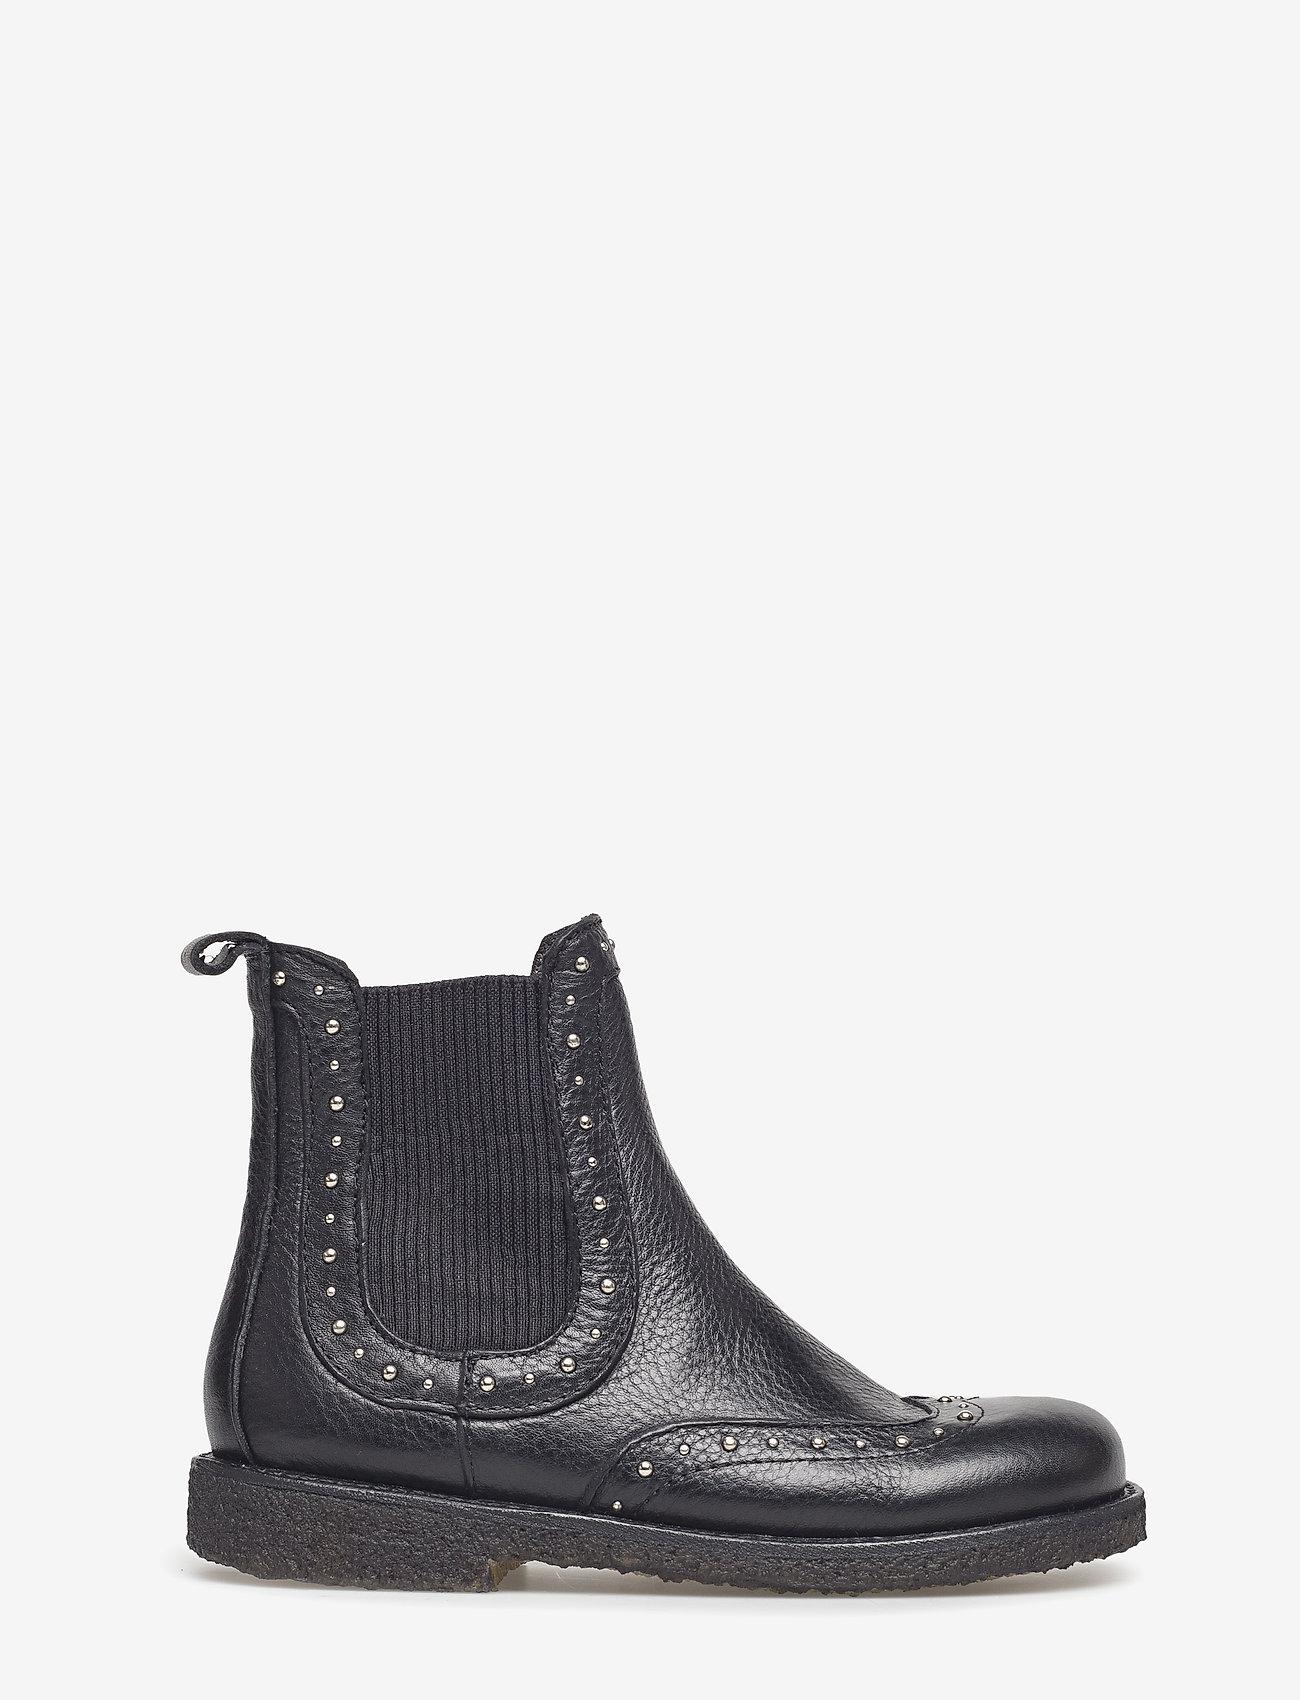 ANGULUS - Booties - flat - with elastic - stiefel - 1933/019 black/black - 1